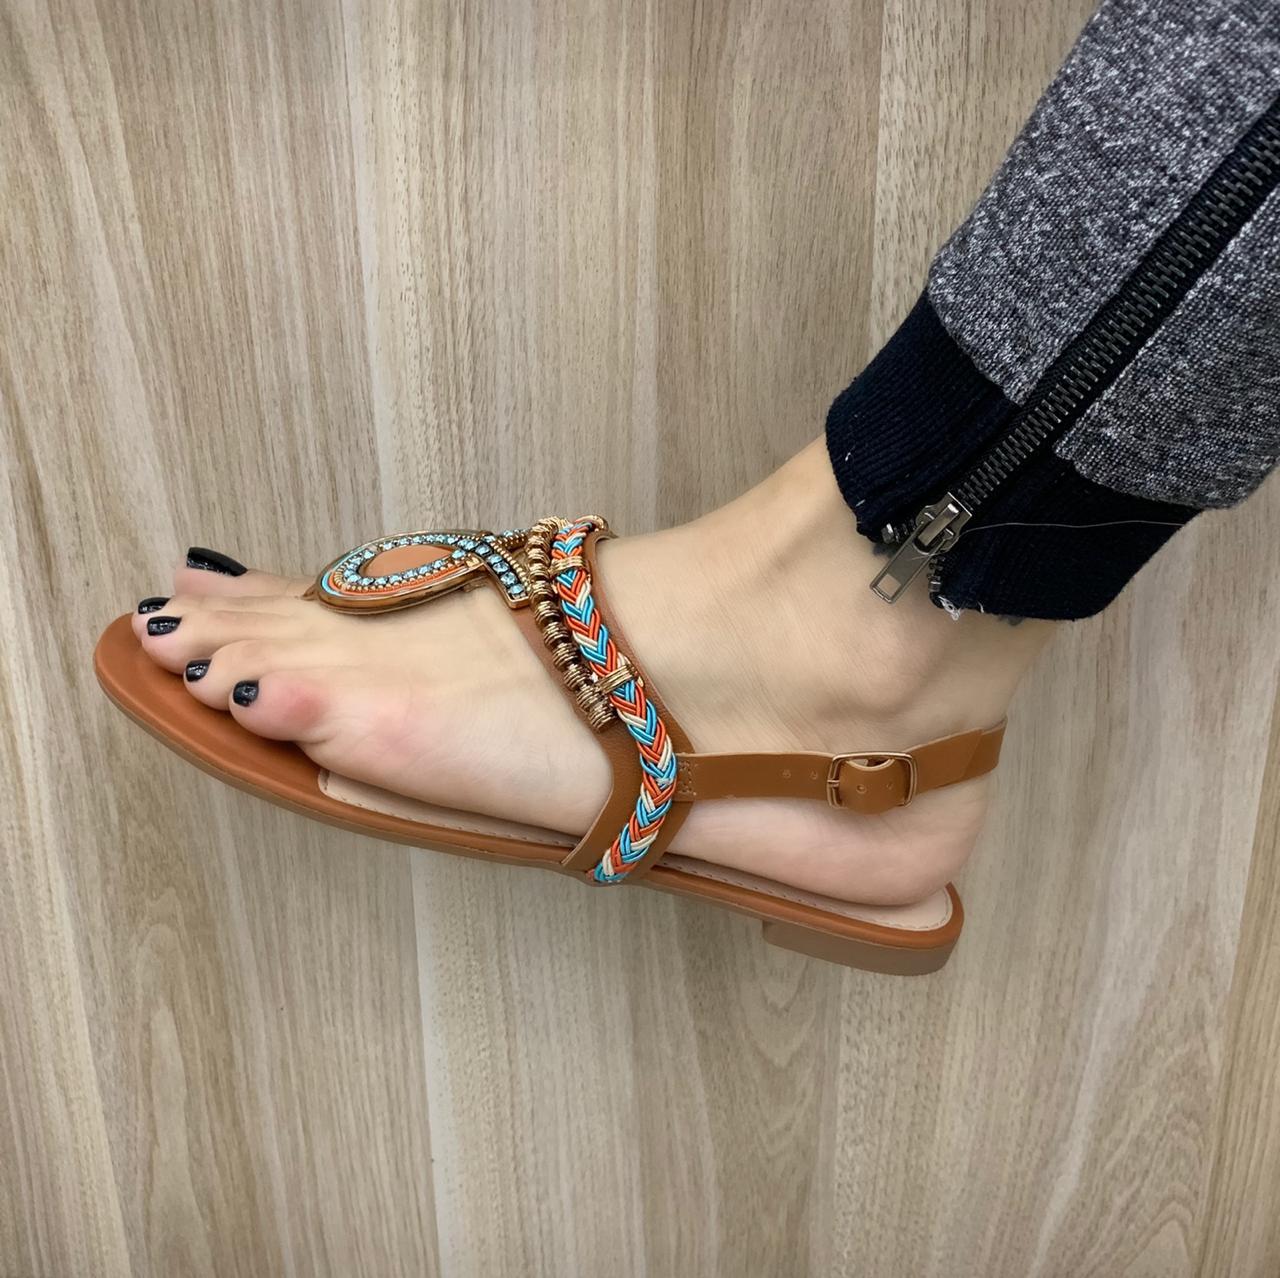 Sandália Rasterinha Dakota Com Pedras Z5652 Feminina